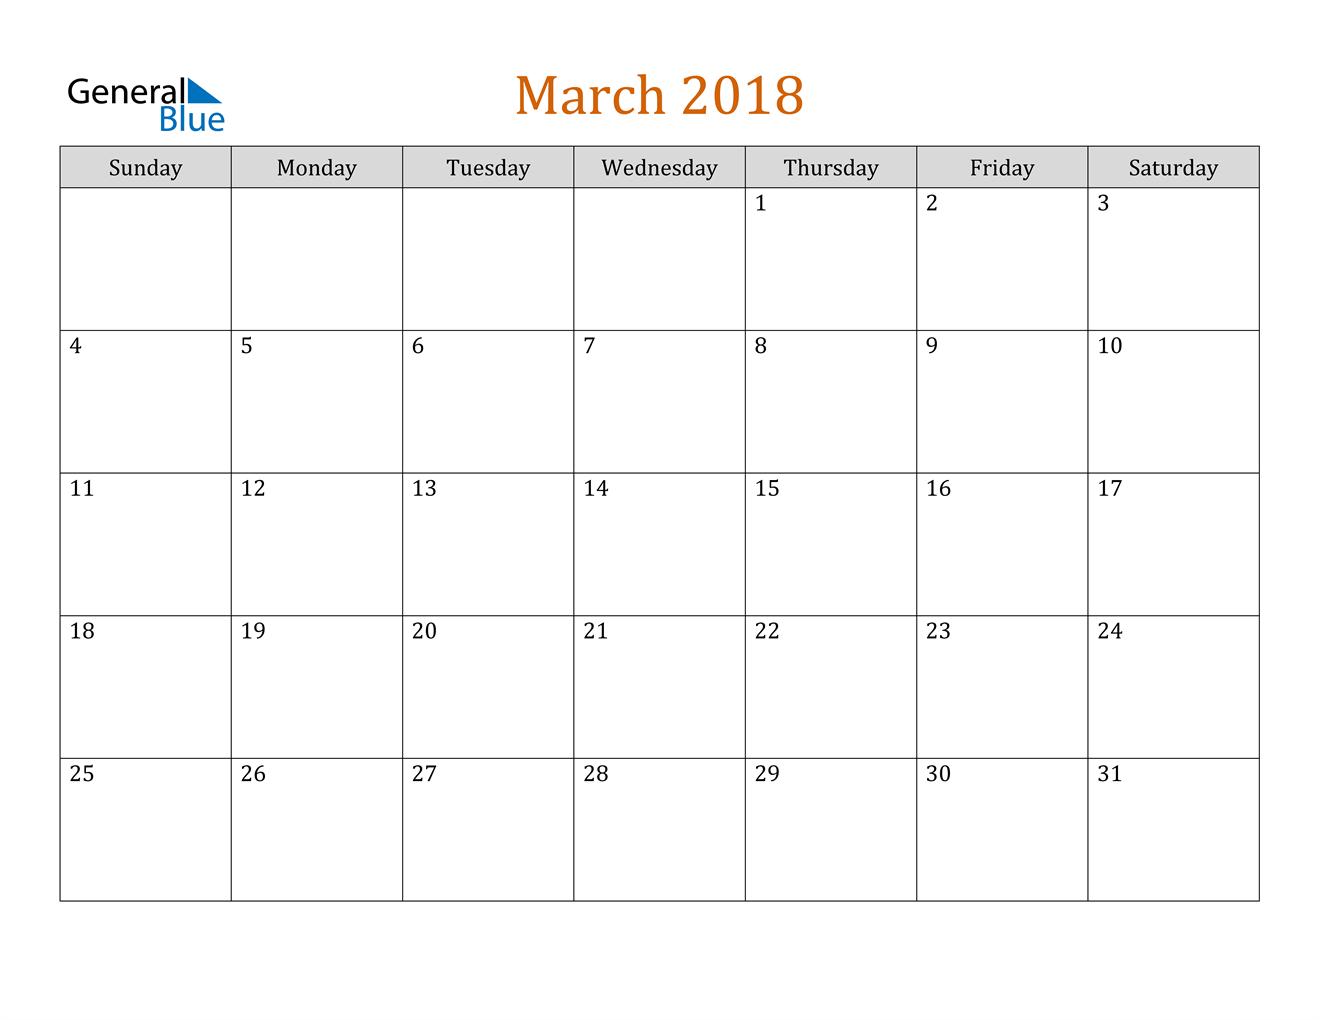 Image of March 2018 Contemporary Orange PDF, Word and Excel Calendar Calendar